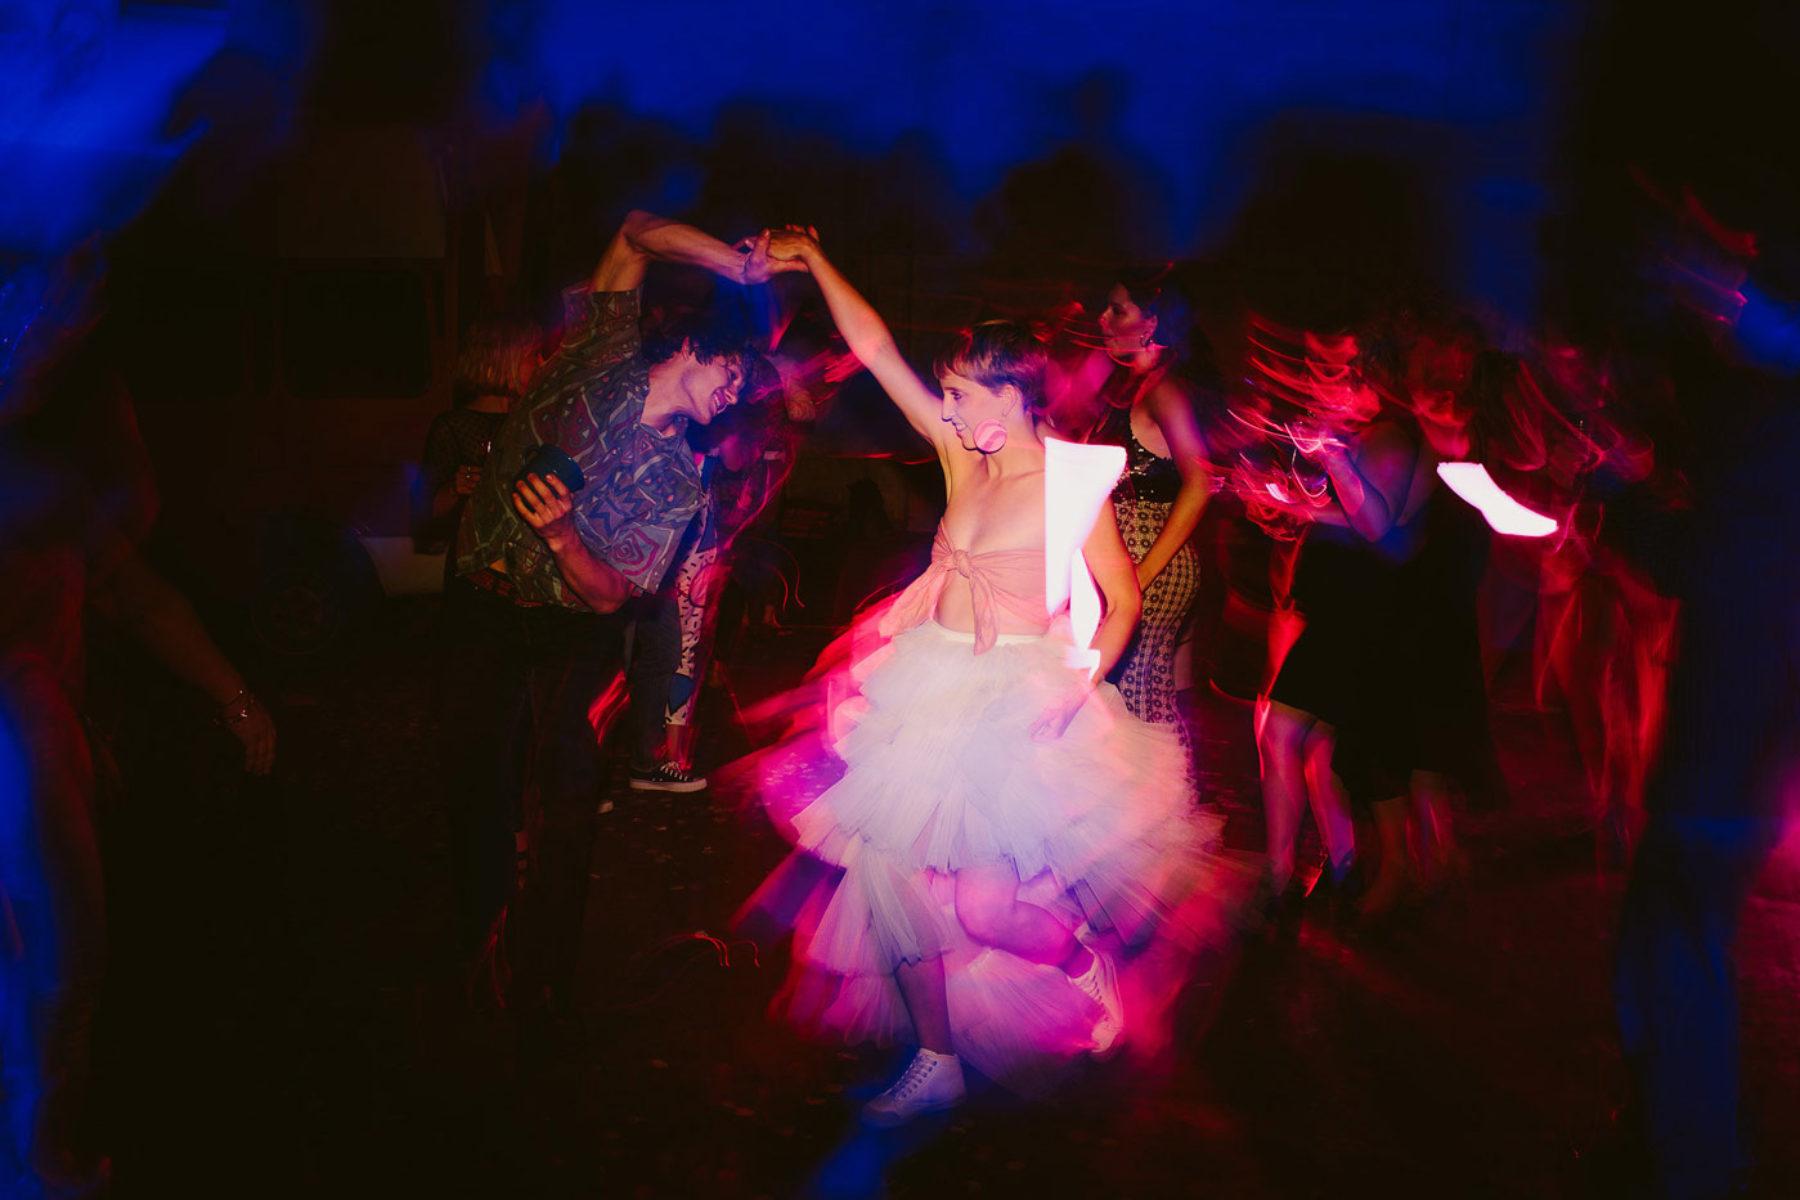 adelaide-warehouse-party-wedding-46-1800x0-c-default.jpg